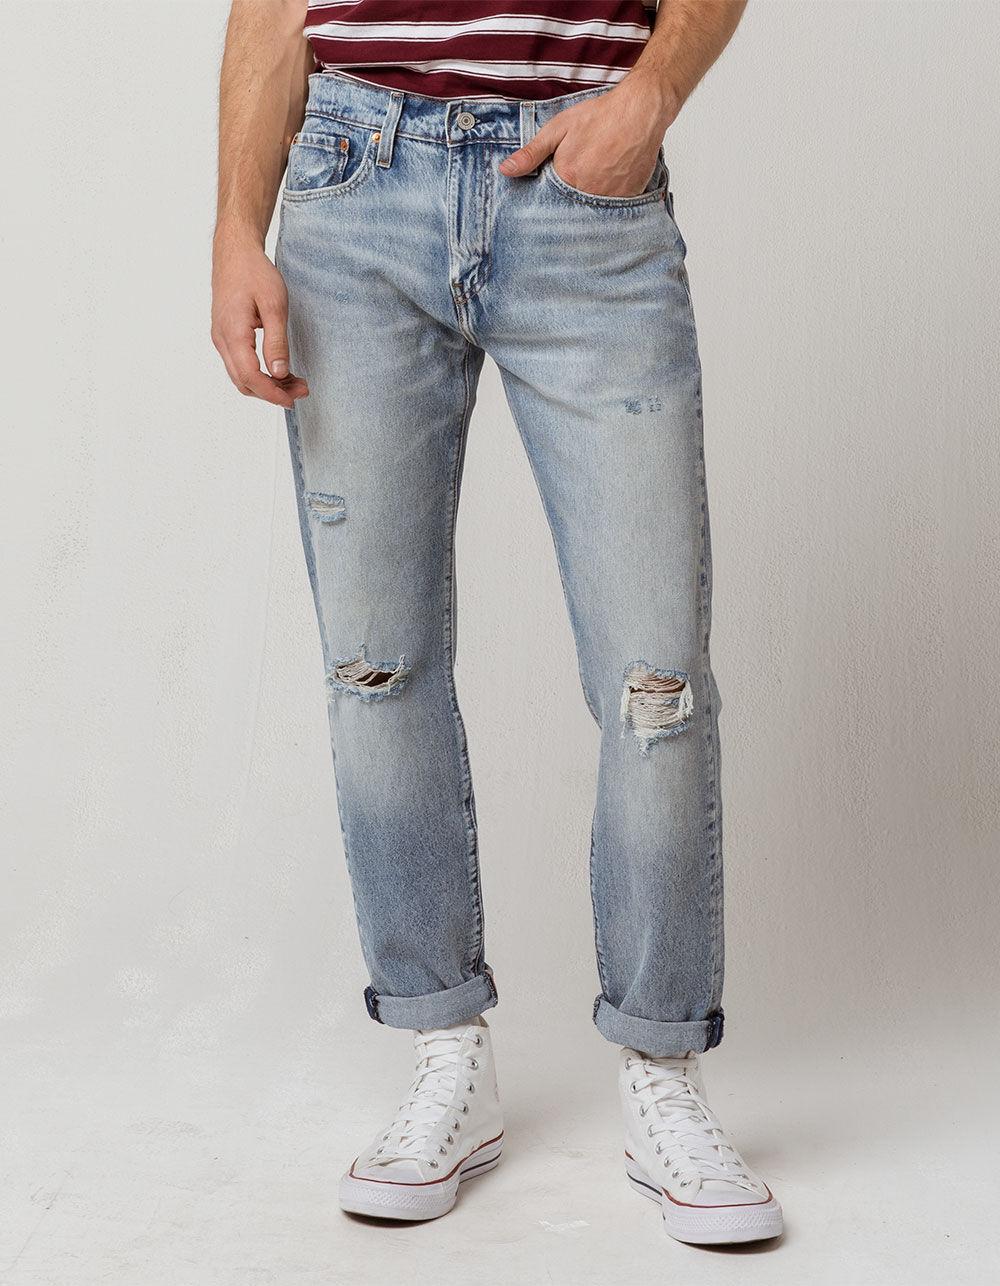 LEVI'S Hi-ball Roll Swing Man Jeans